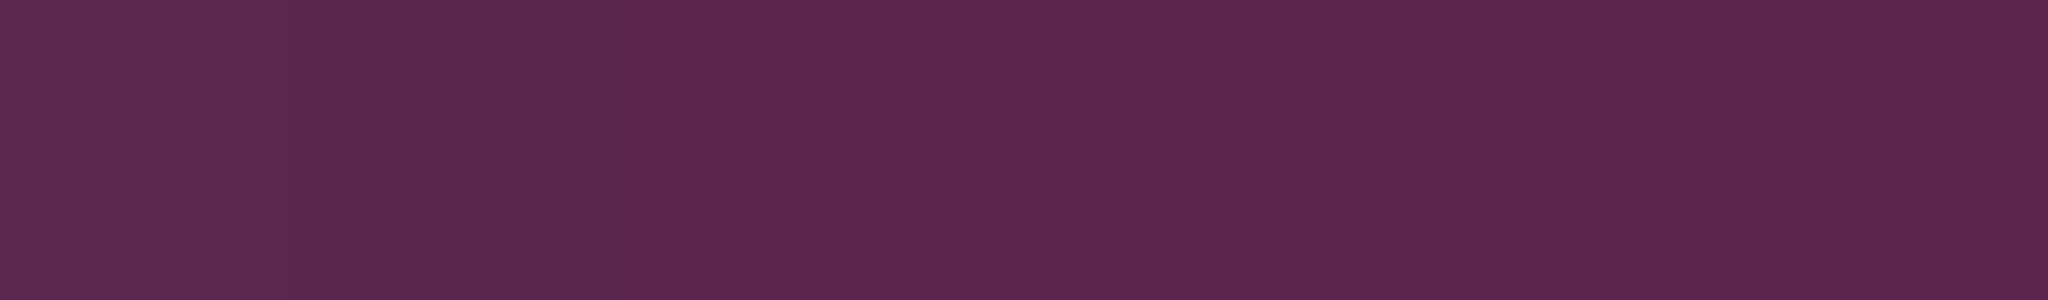 HU 15622 Chant ABS Violet Lisse Brillant 90°